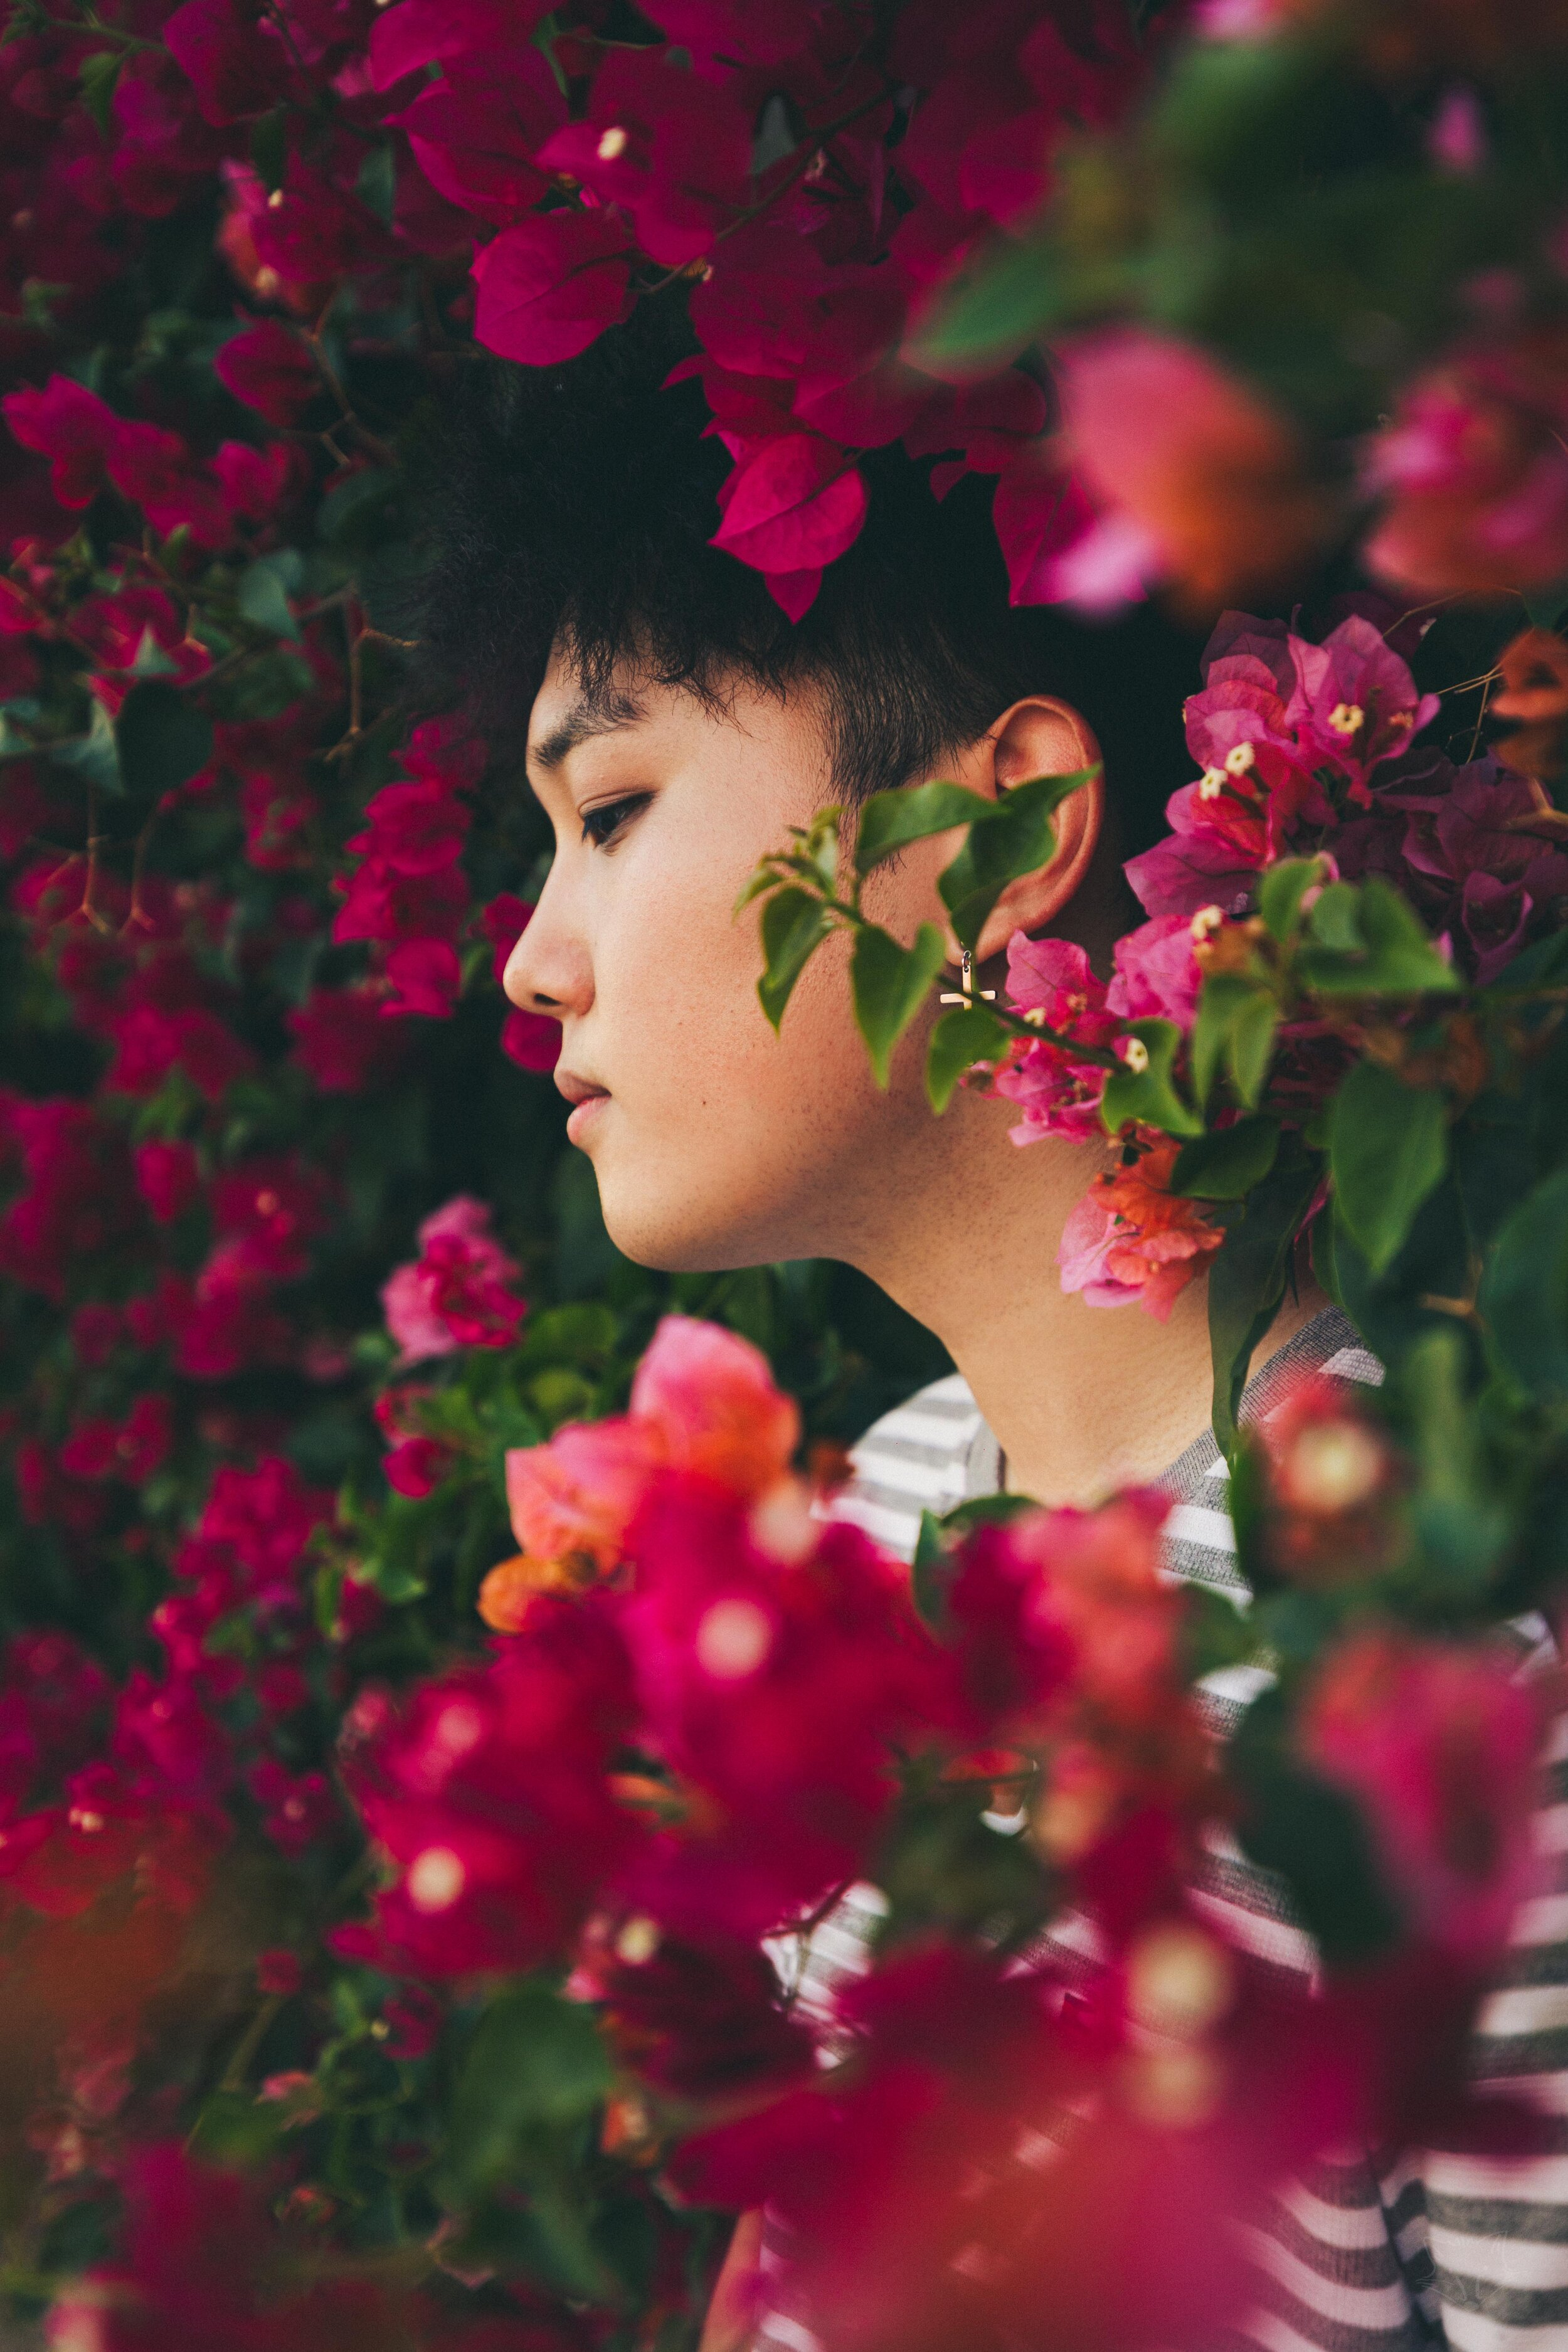 los_angeles_photo_shoot_joshua_chun_photography-5258.jpg